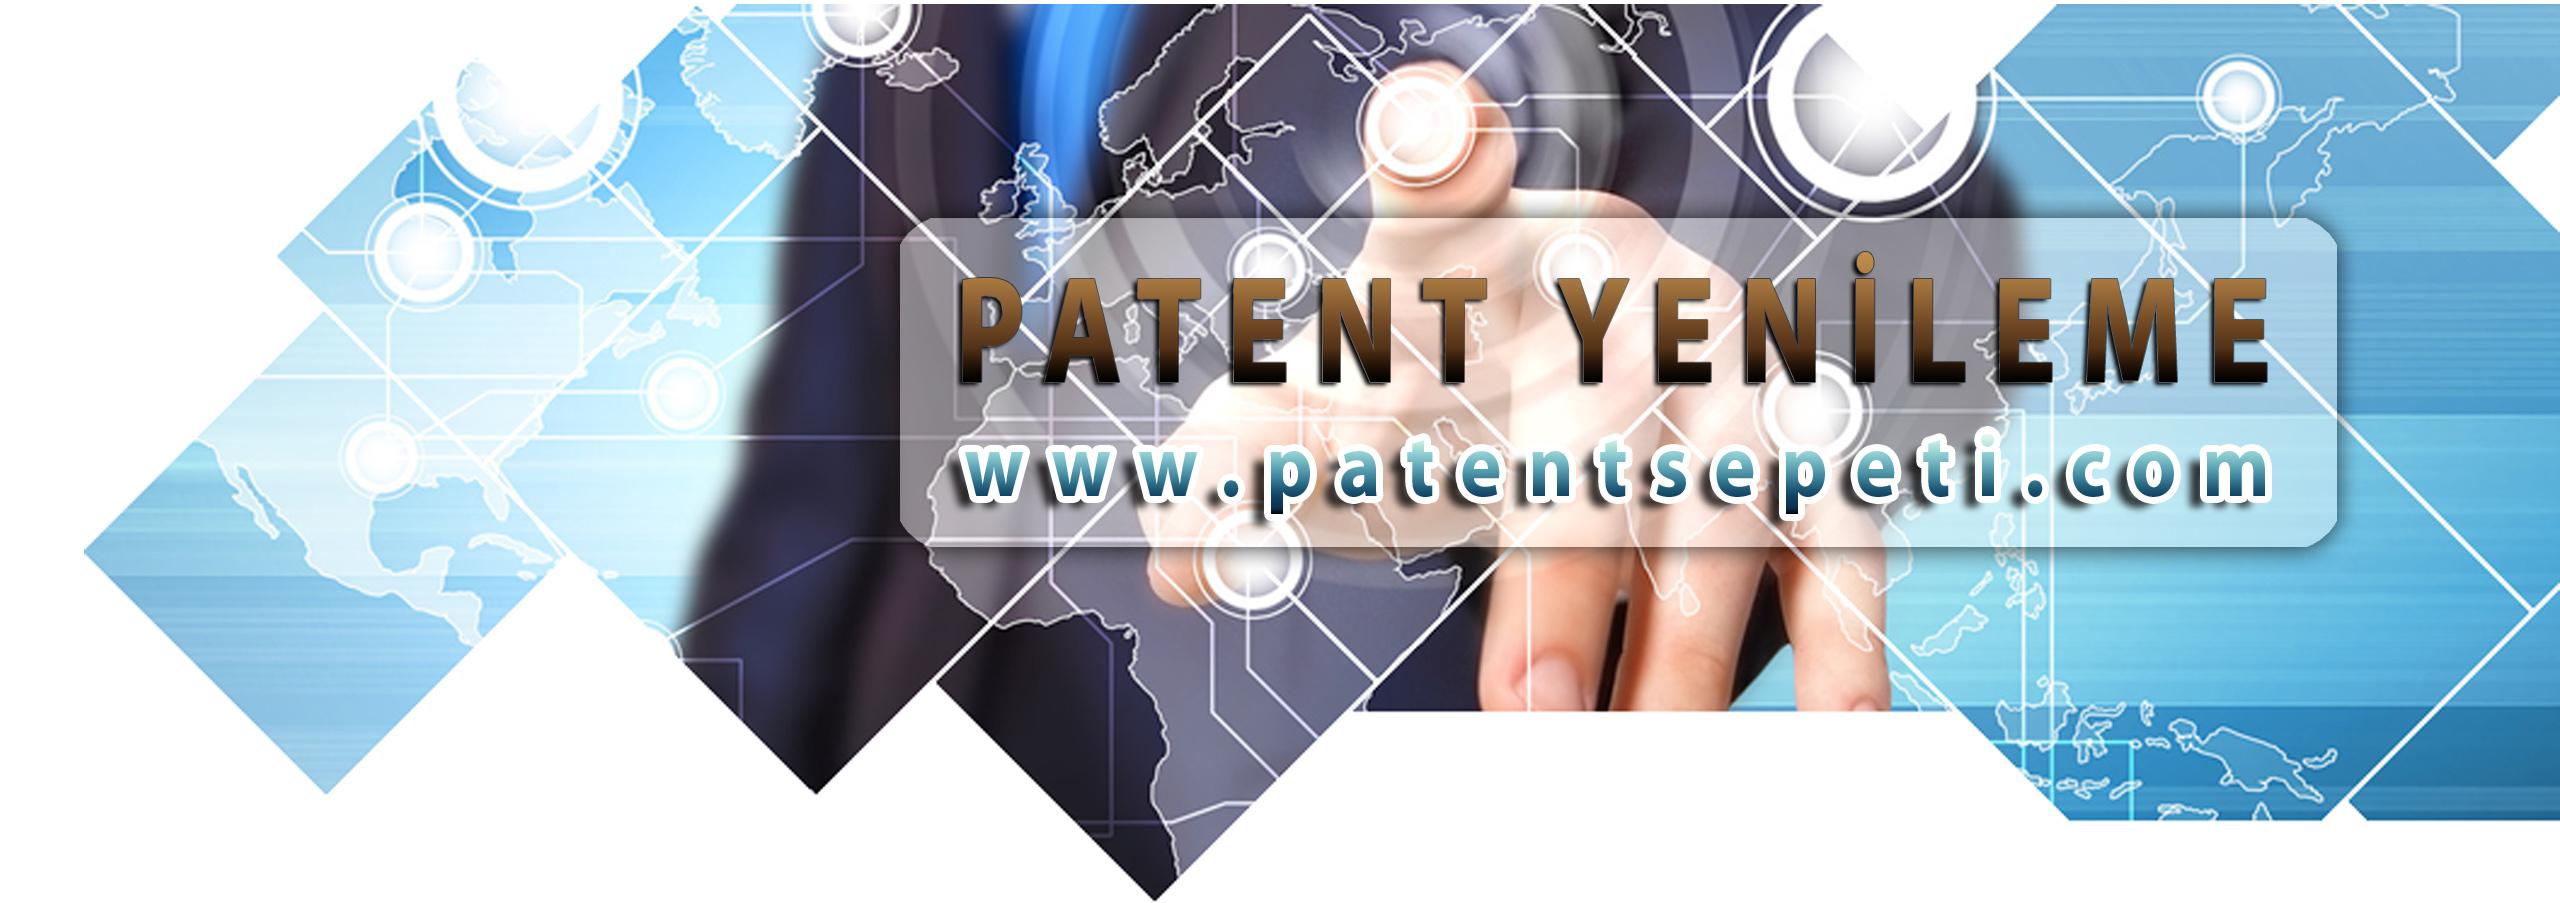 patent yenileme